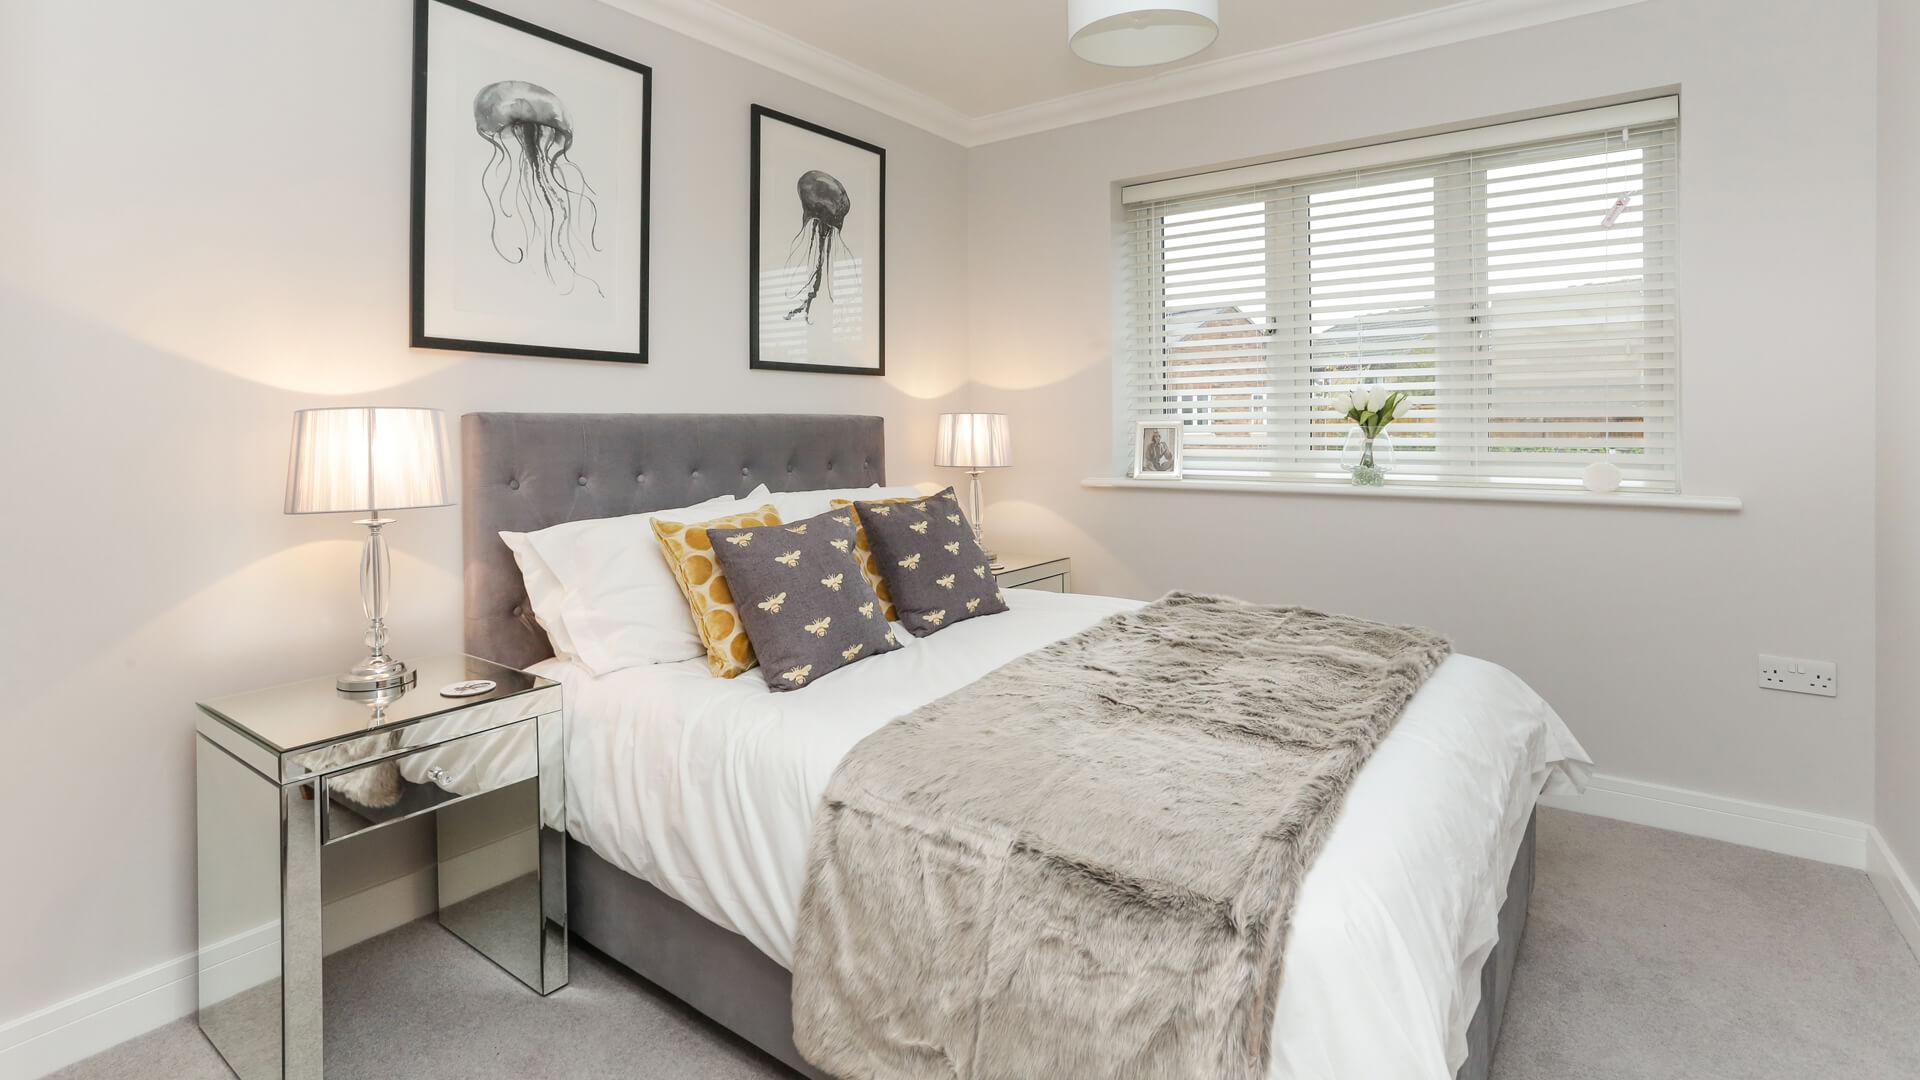 Double bed in dressed bedroom